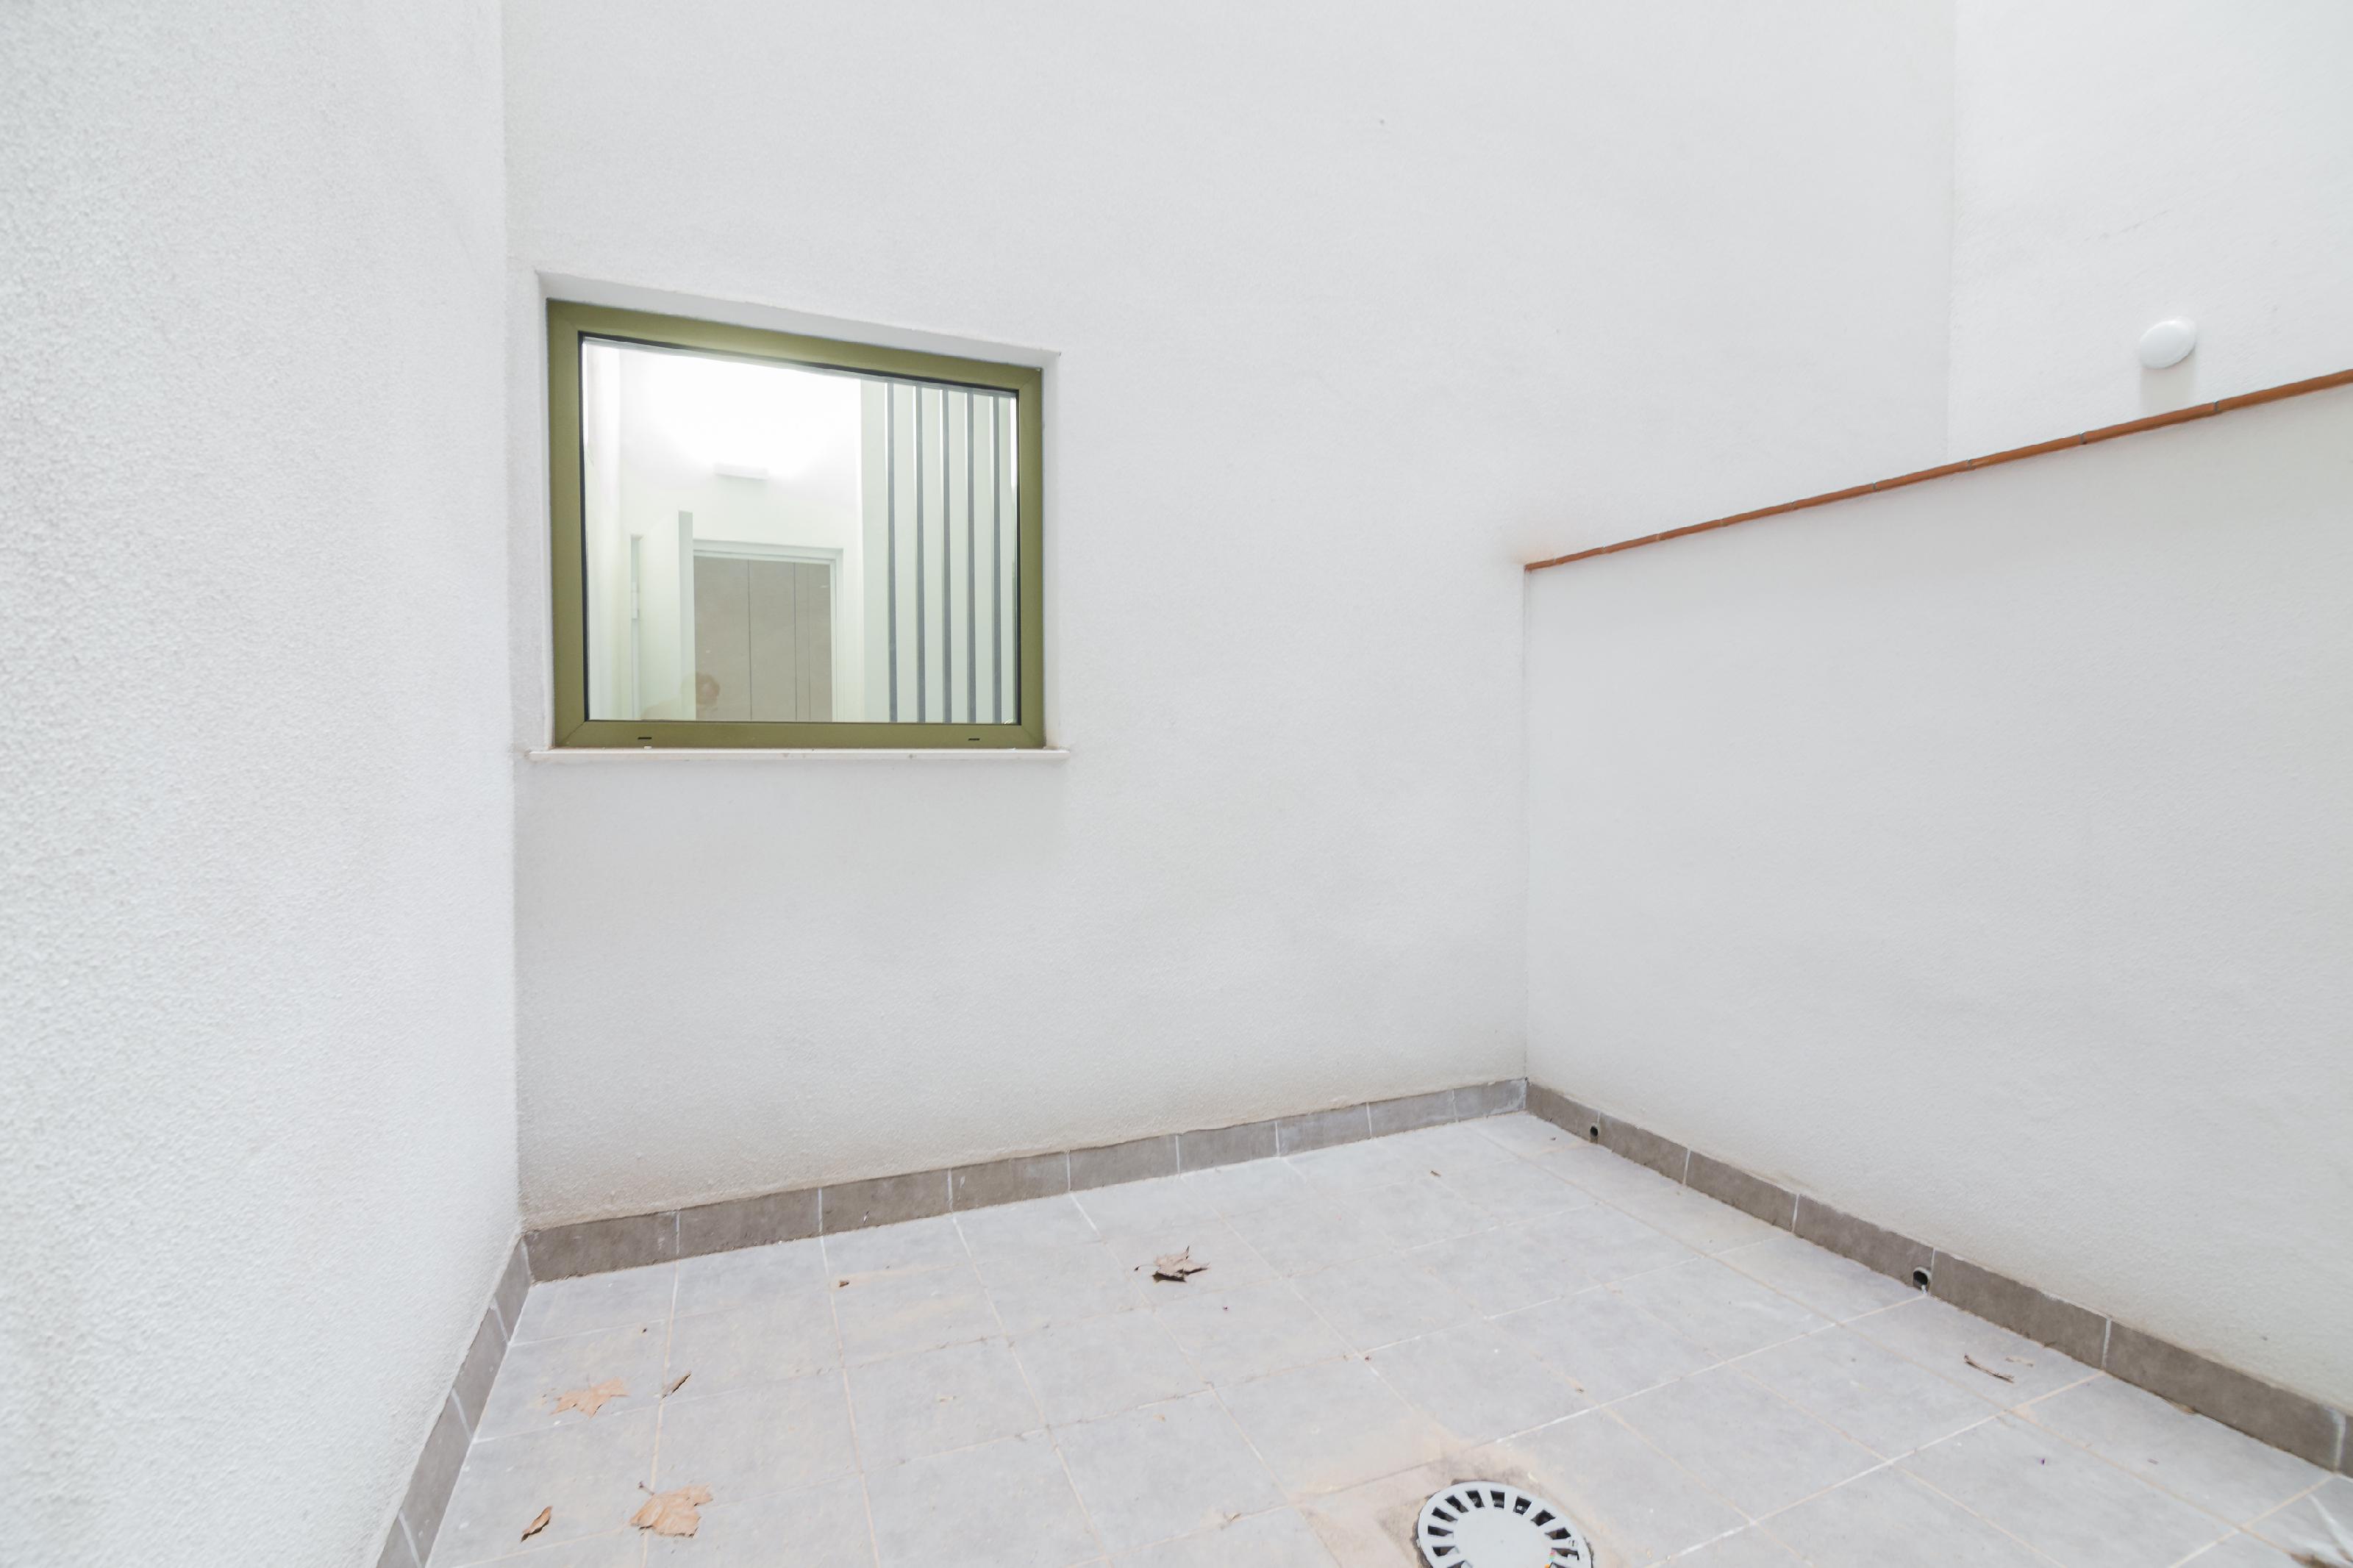 249266 Flat for sale in Eixample, Nova Esquerra Eixample 26